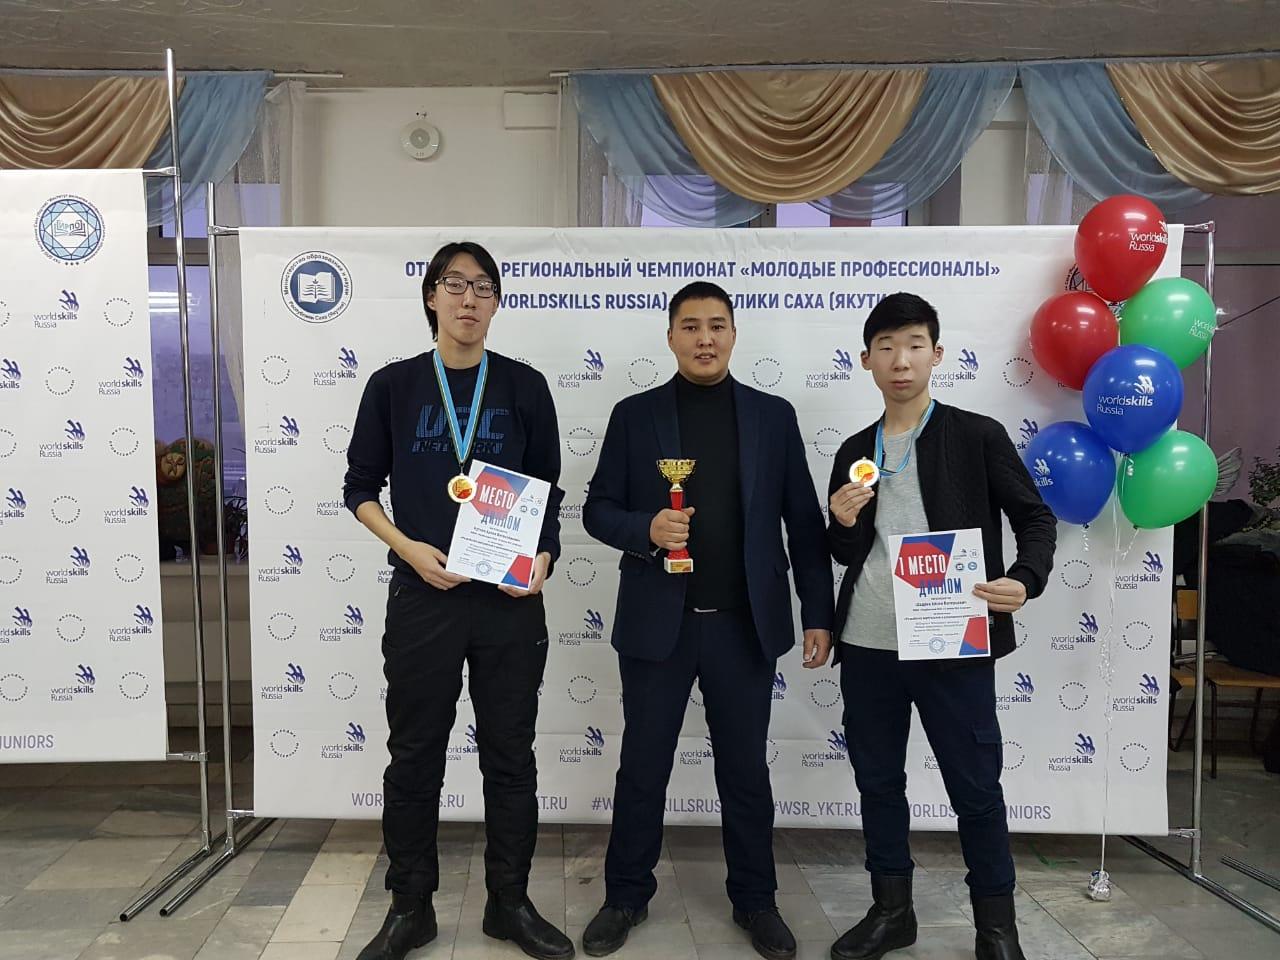 Прошел VIII Открытый Региональный Чемпионат «Молодые профессионалы» World Skills Russia